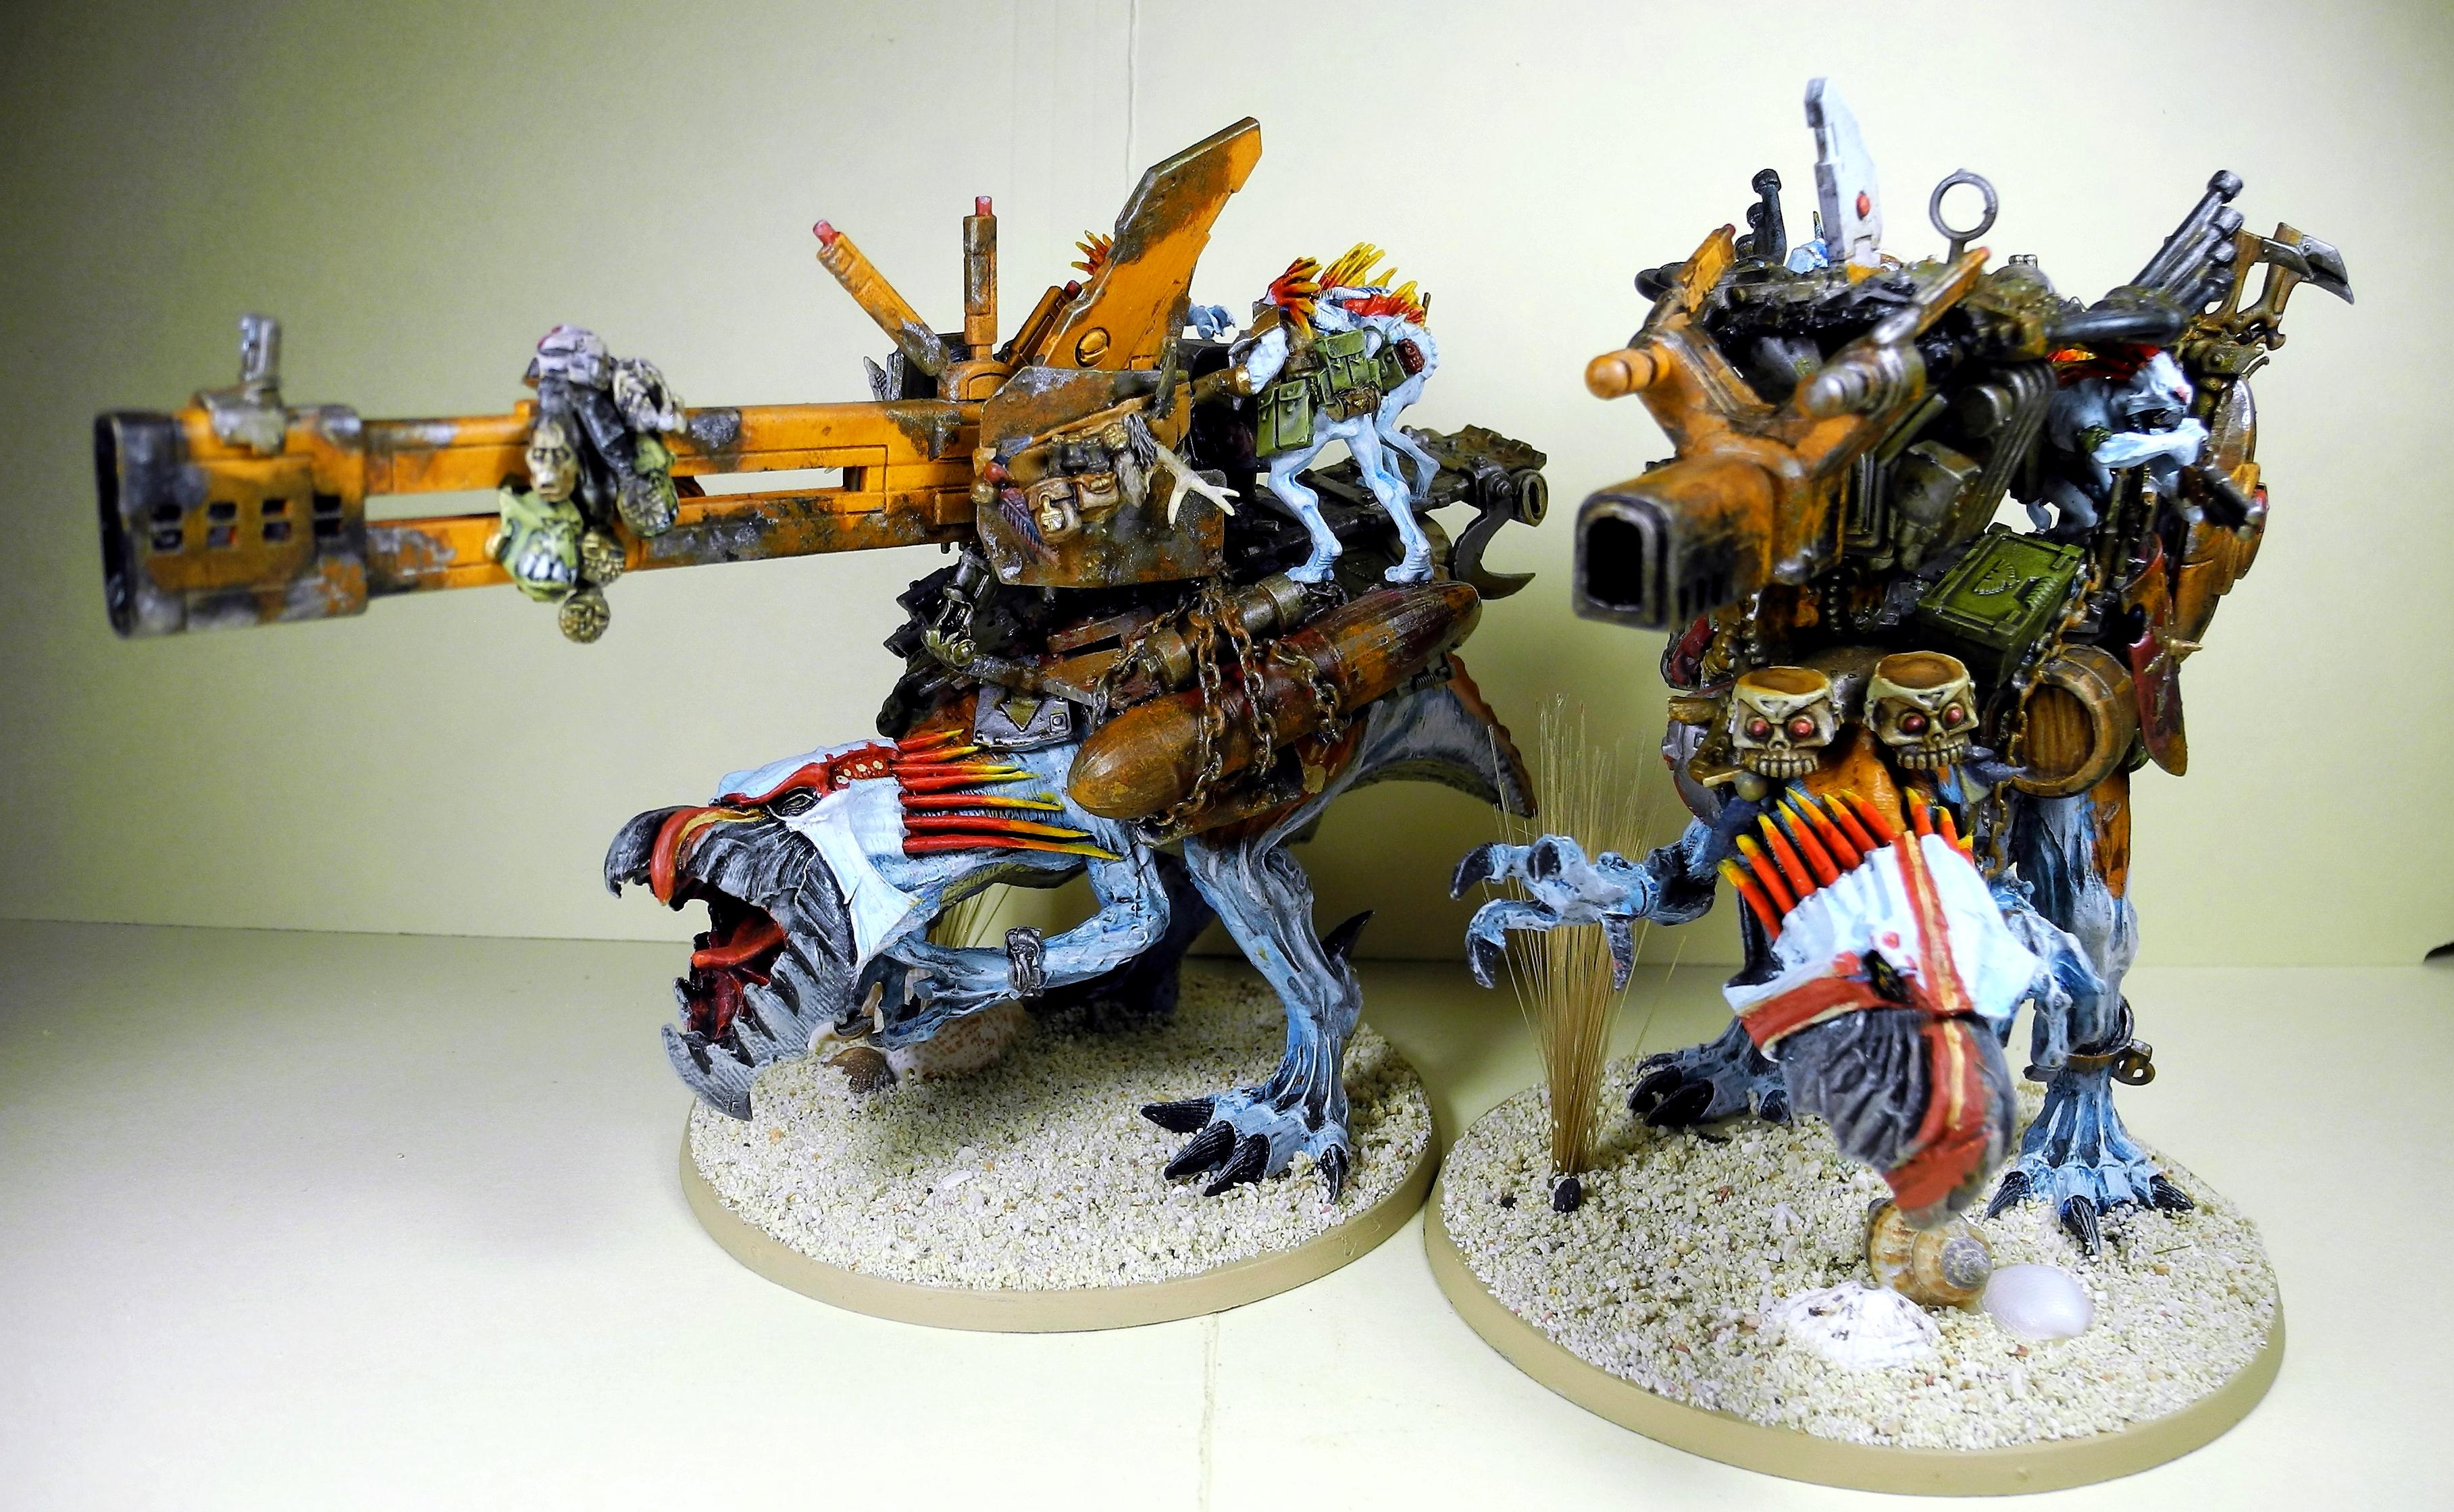 Cavalry, Greater Knarloc, Knarloc, Kroot, Mercenary, Xenos